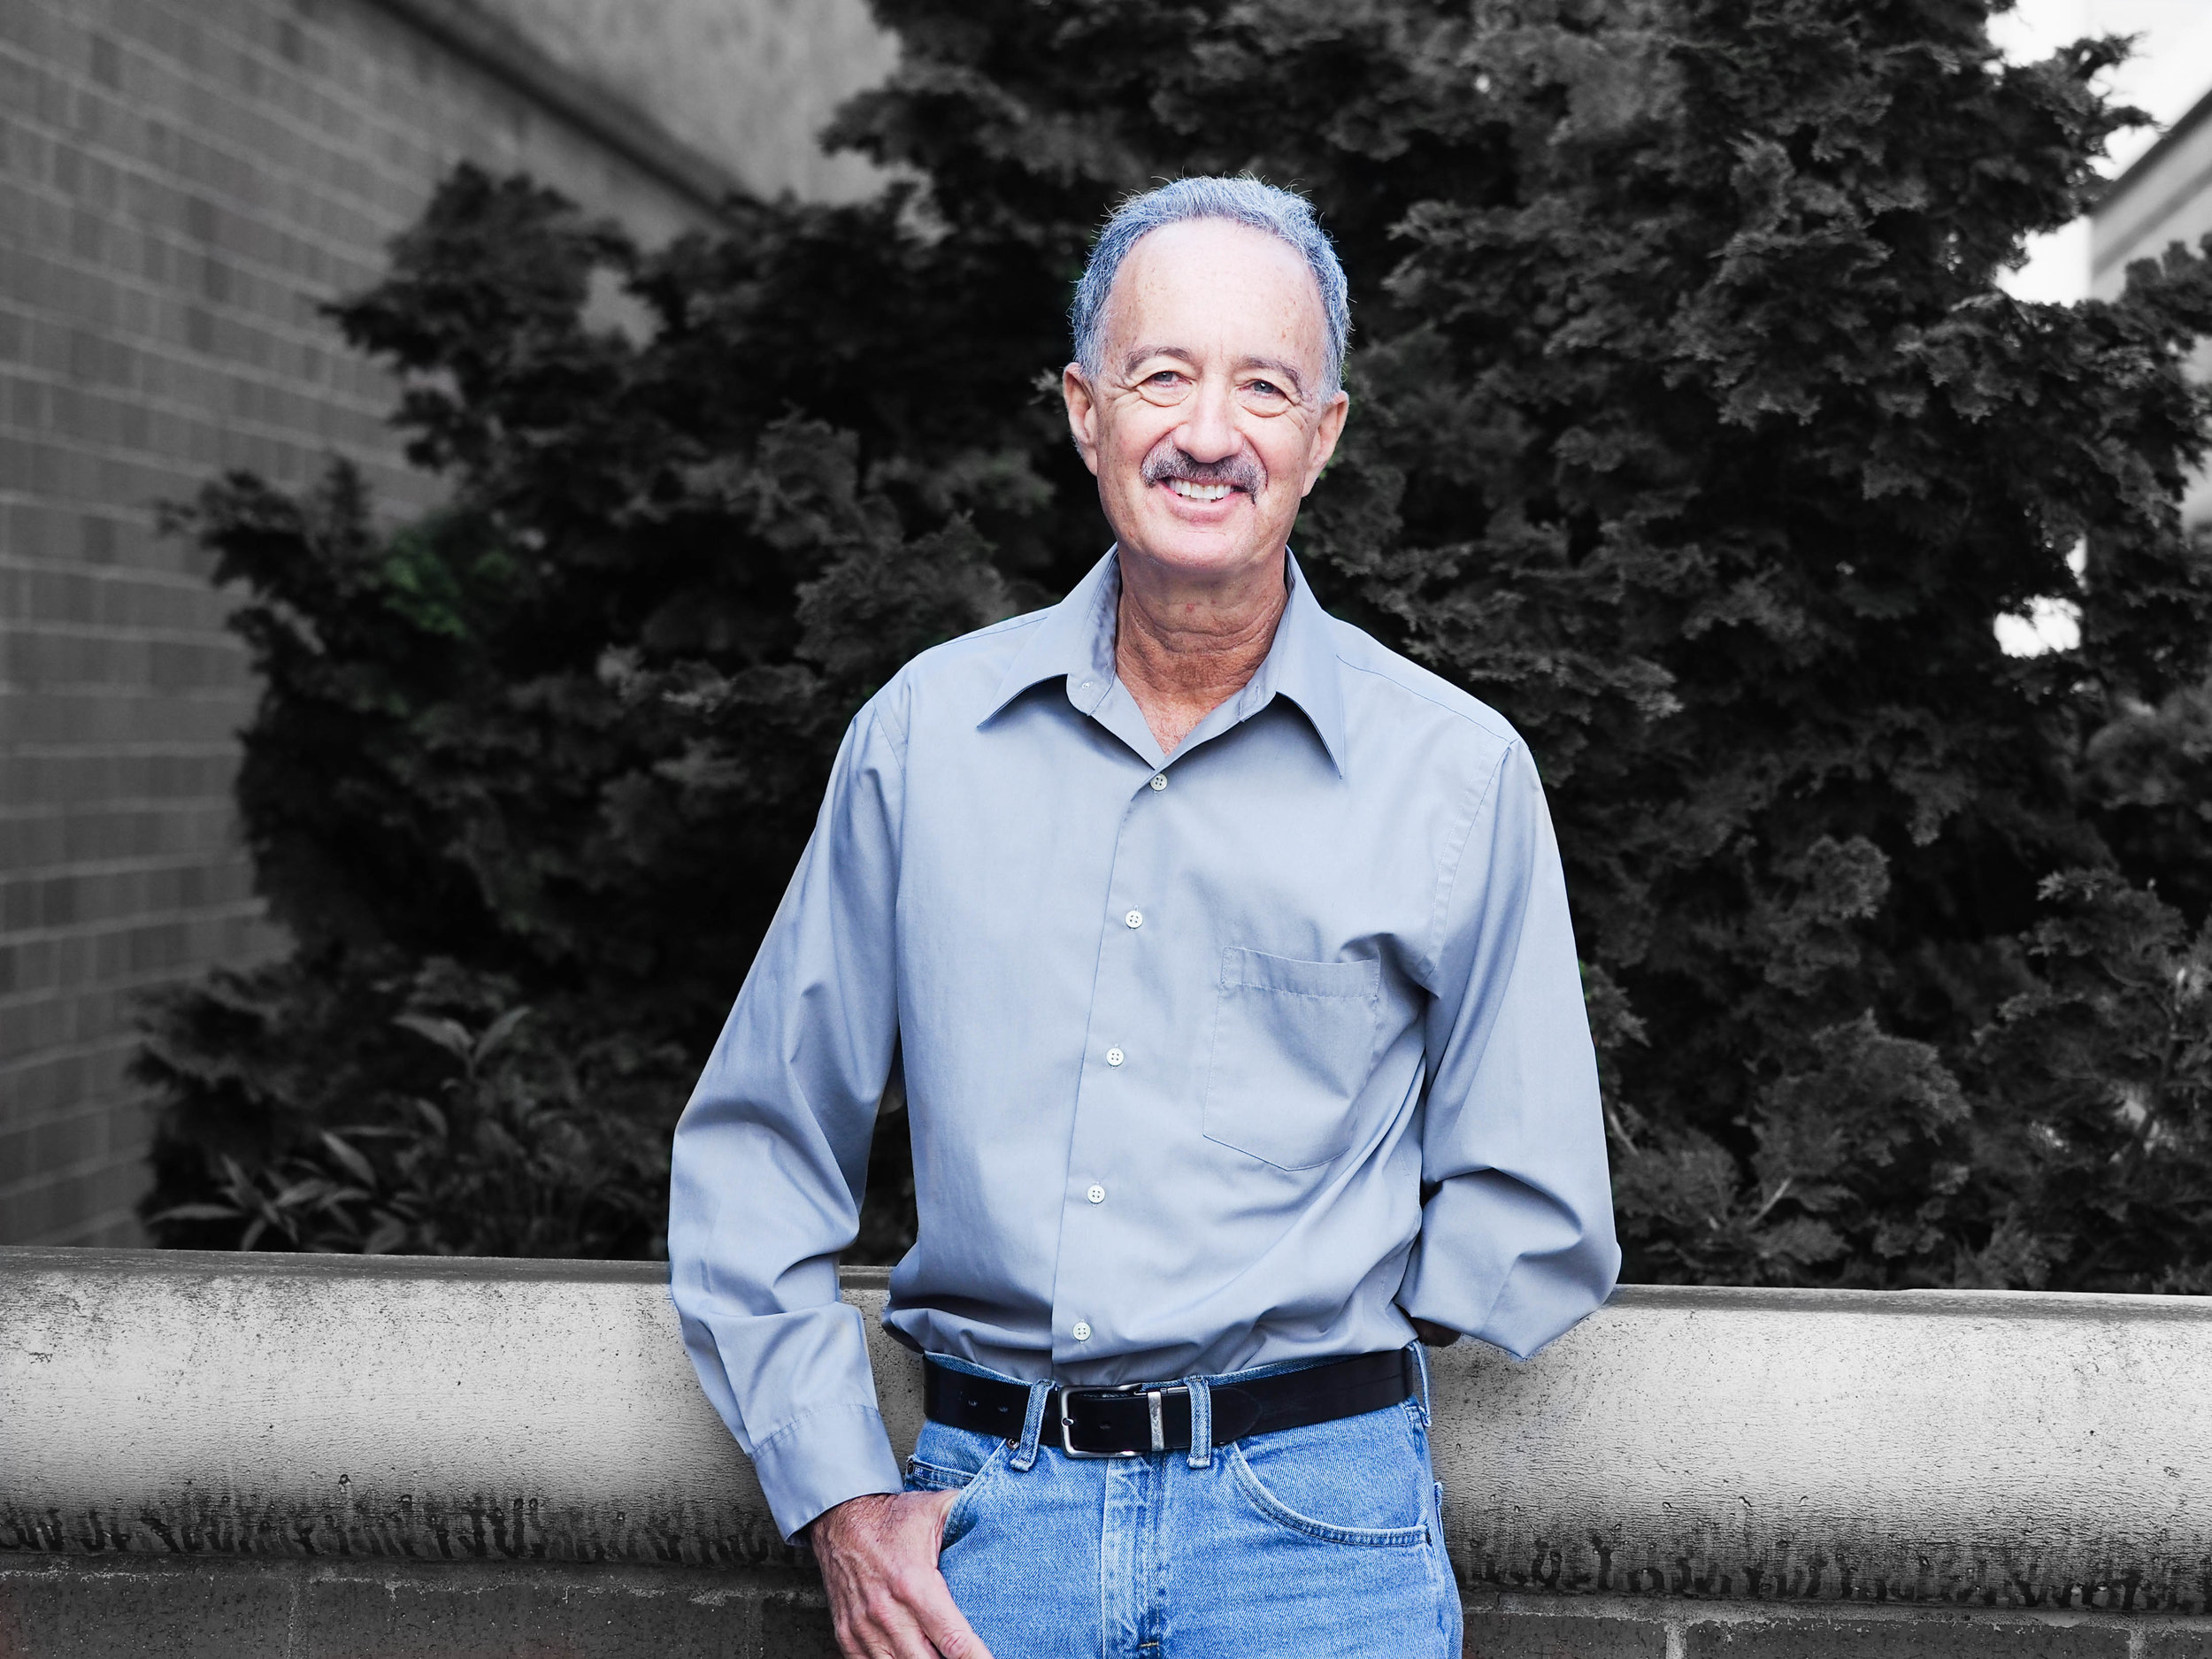 EVAN - Professor of Toxicology and Director of UW Superfund Research Program